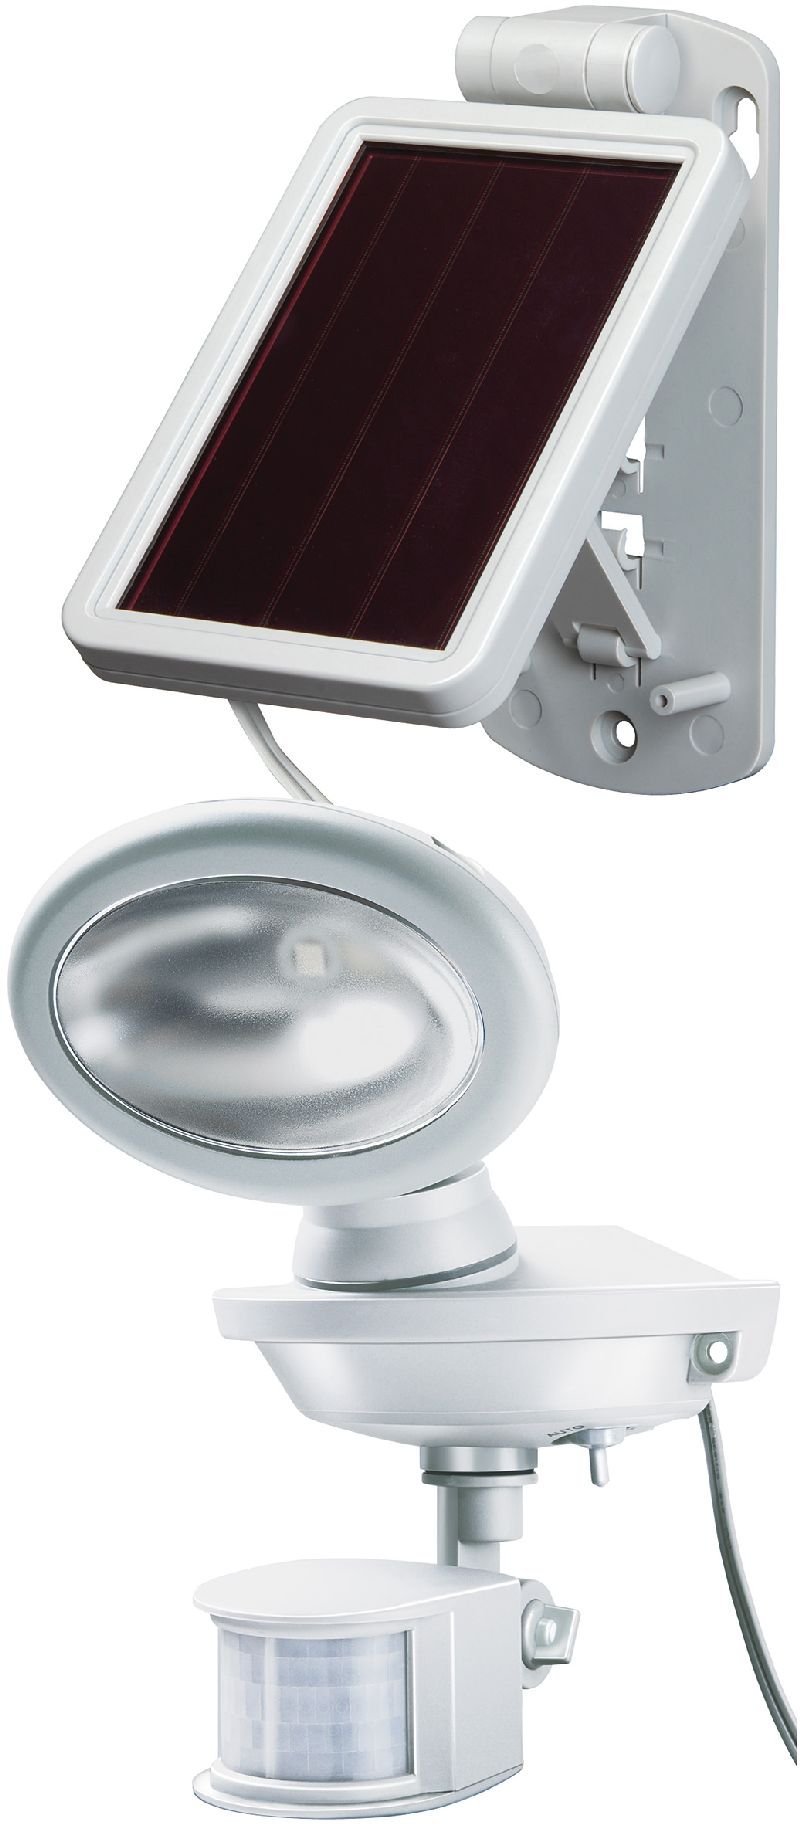 Solar LED-Au�enleuchte SOL 14 plus IP44 mit Infrarot-Bewegungsmelder 2xLED 0,5W 85lm Kabell�nge 3m Farbe Grau-Wei�